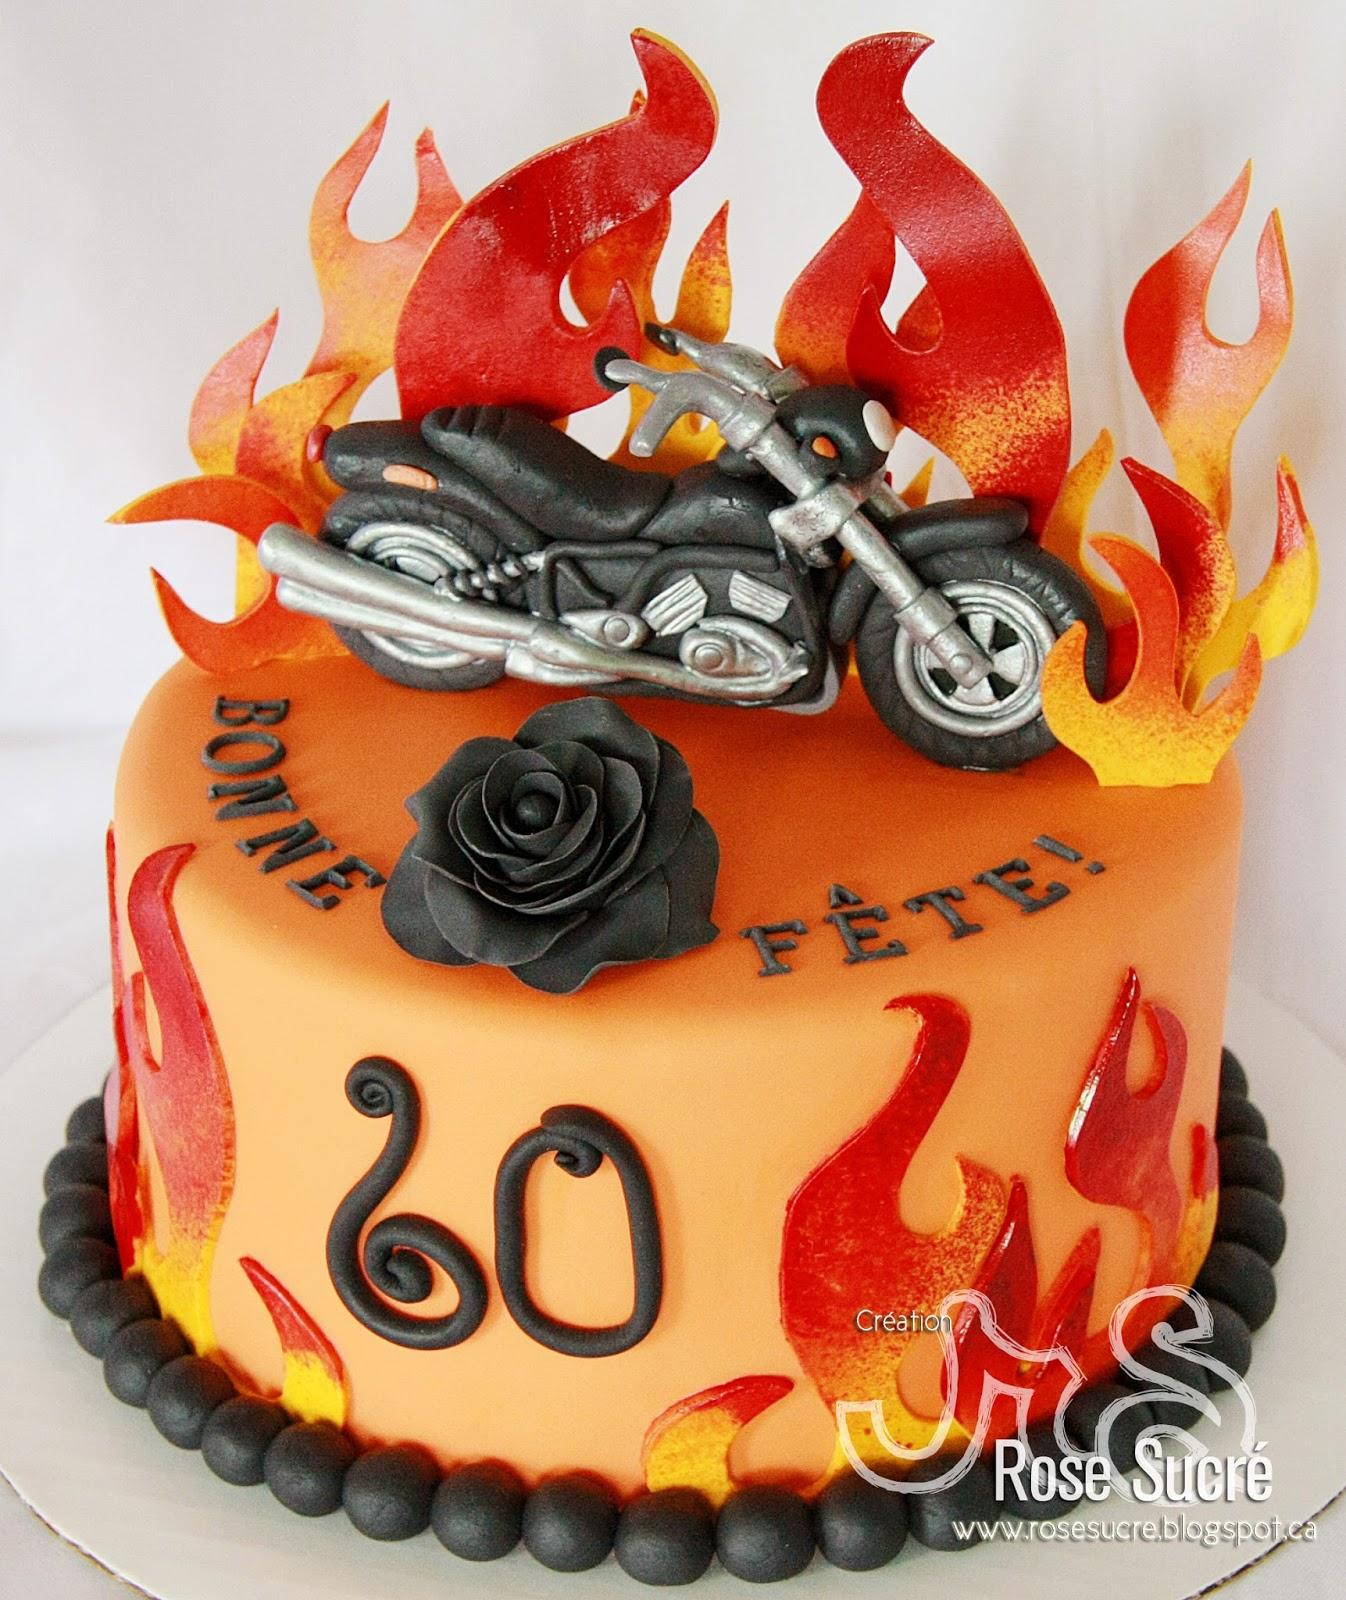 Extrêmement Rose Sucré: Gâteau Moto KU55